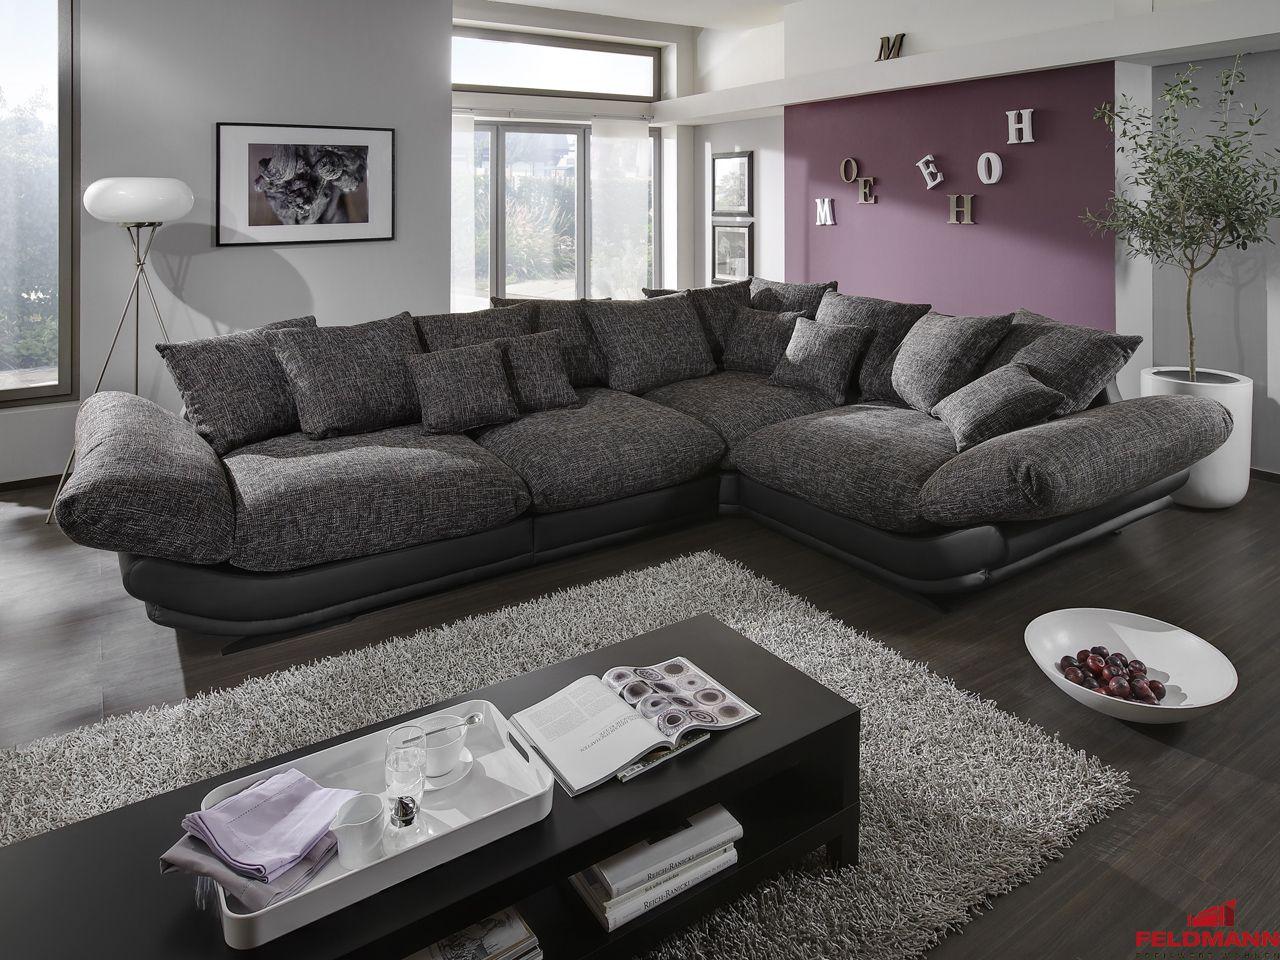 Tolle Xxl Ecksofa Bestes Schlafsofa Ecksofa Sofa Design